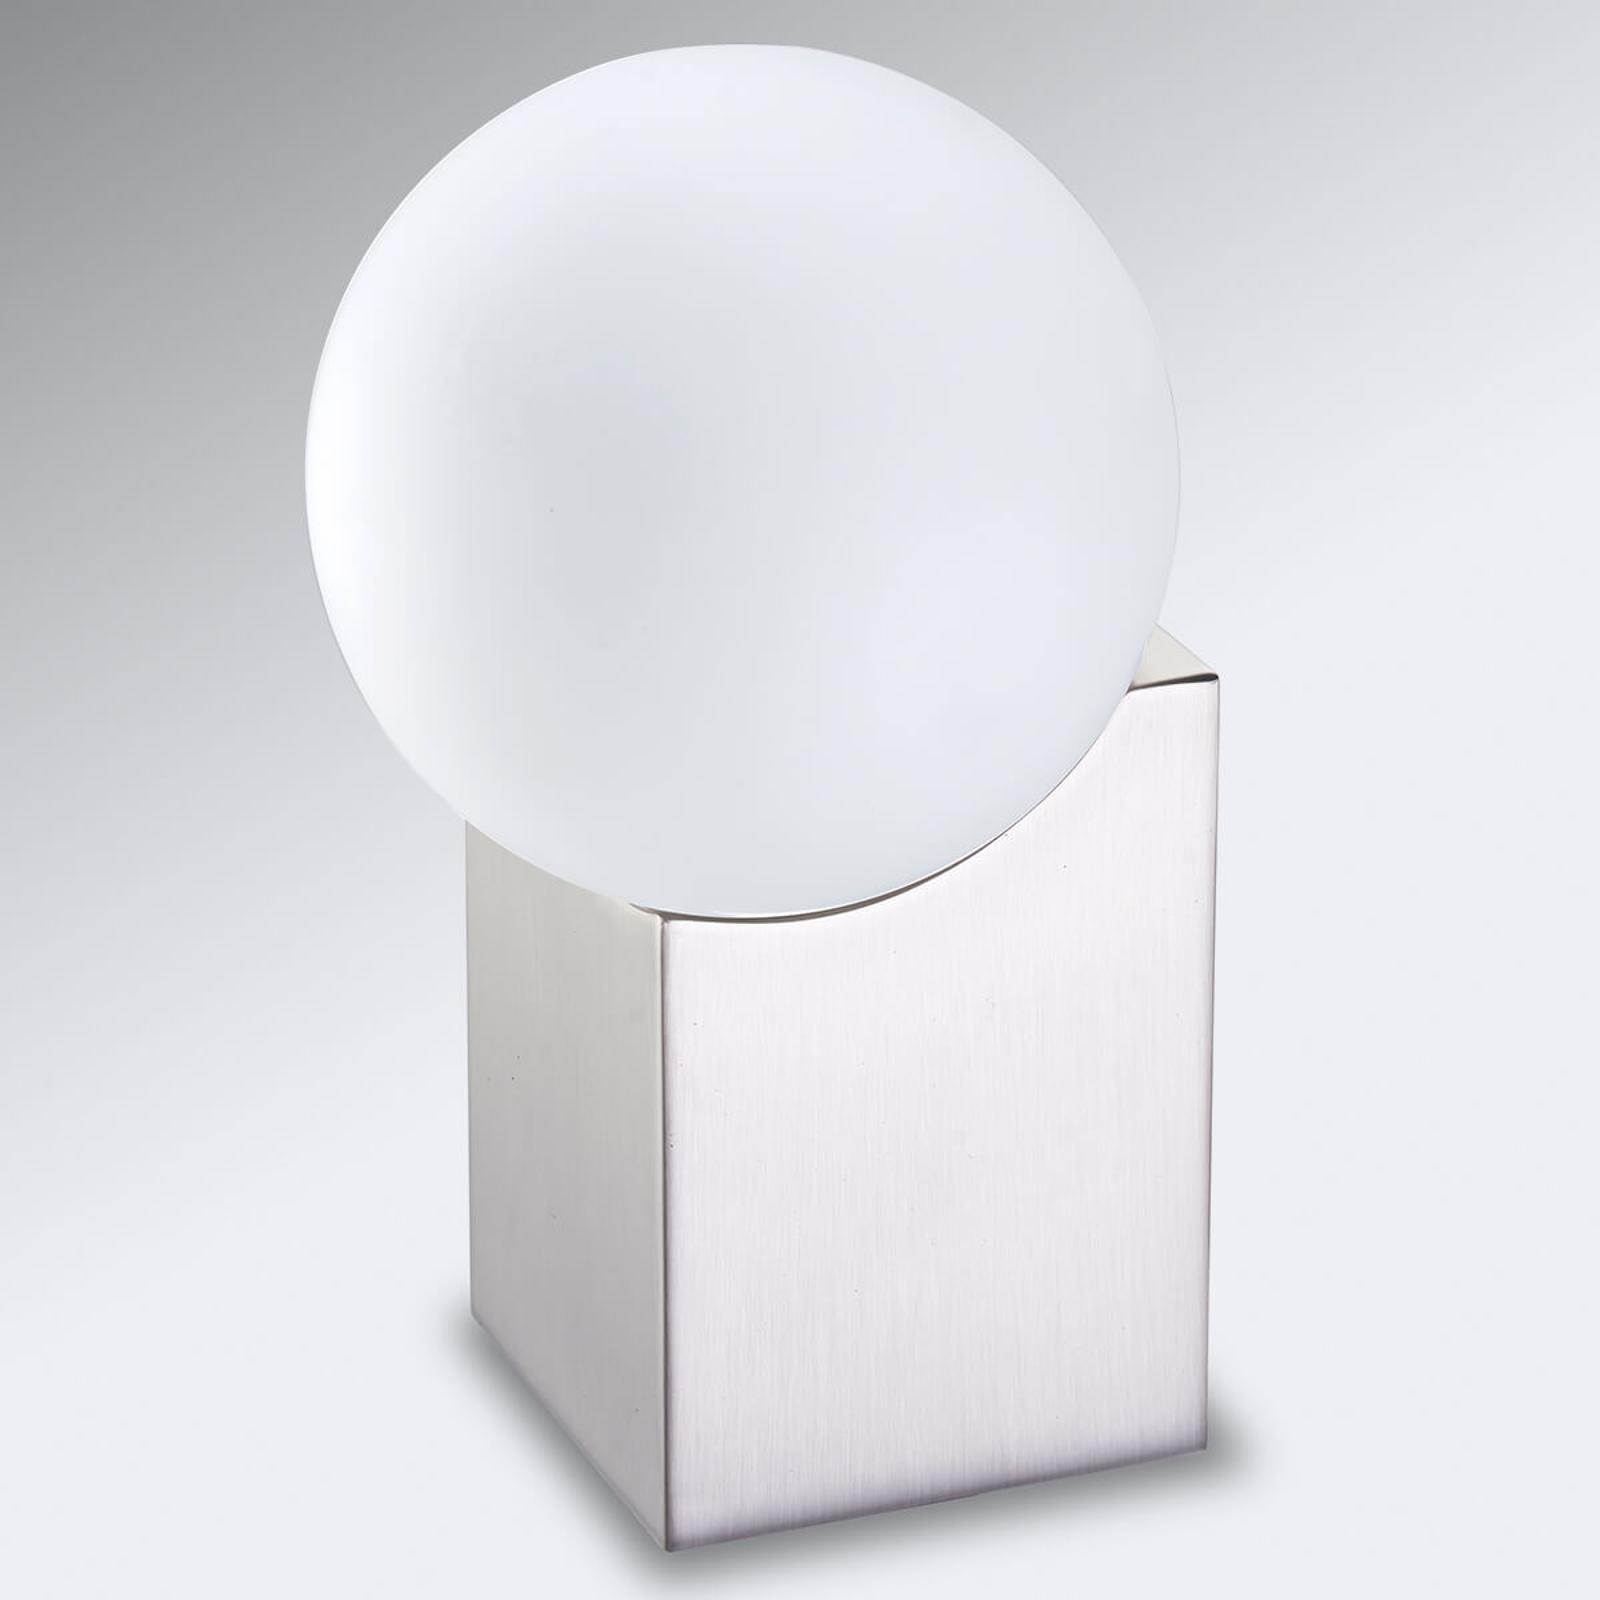 Tischlampe Cub 17,5 cm nickel matt